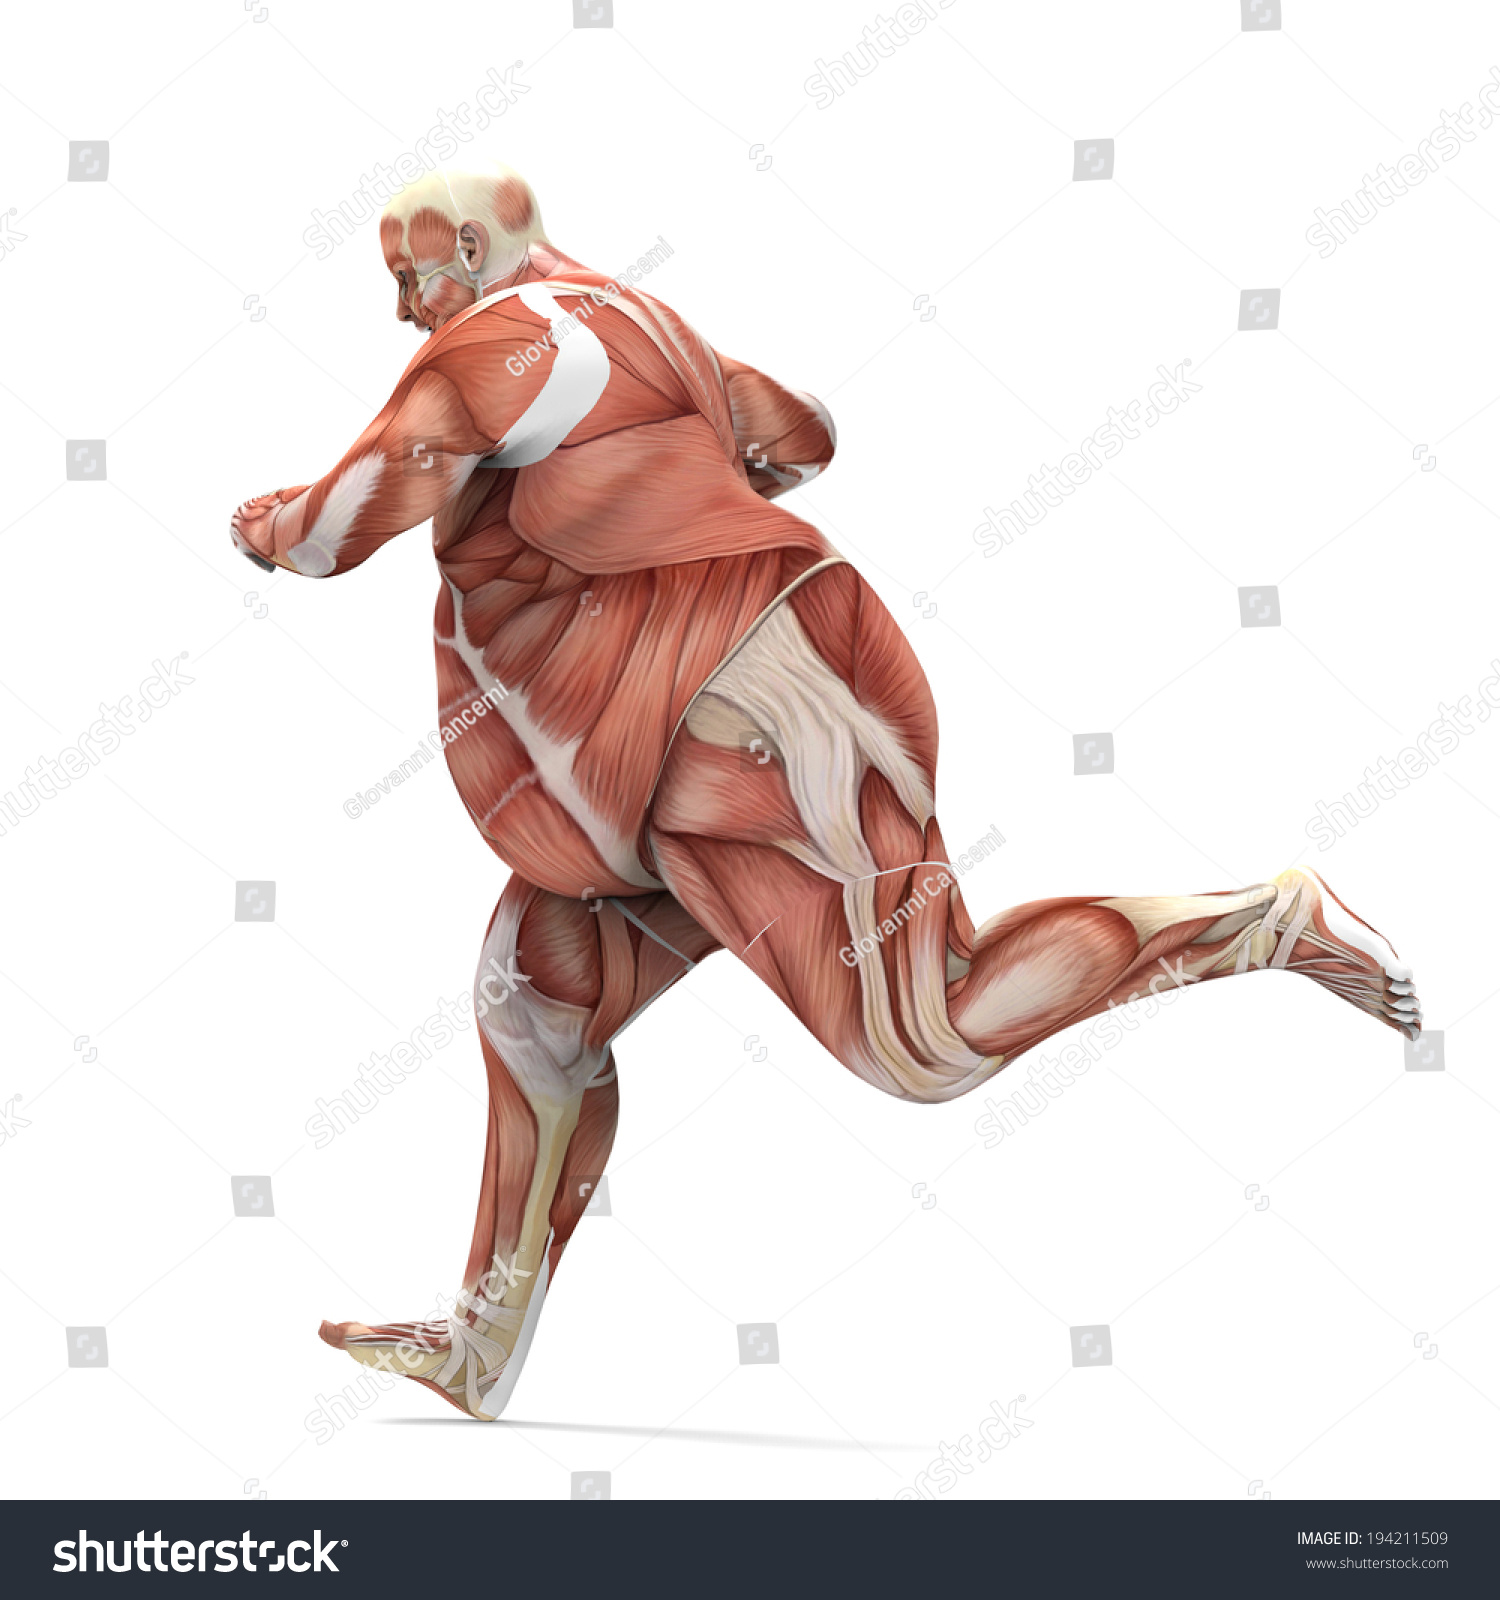 Woman anatomy diagram